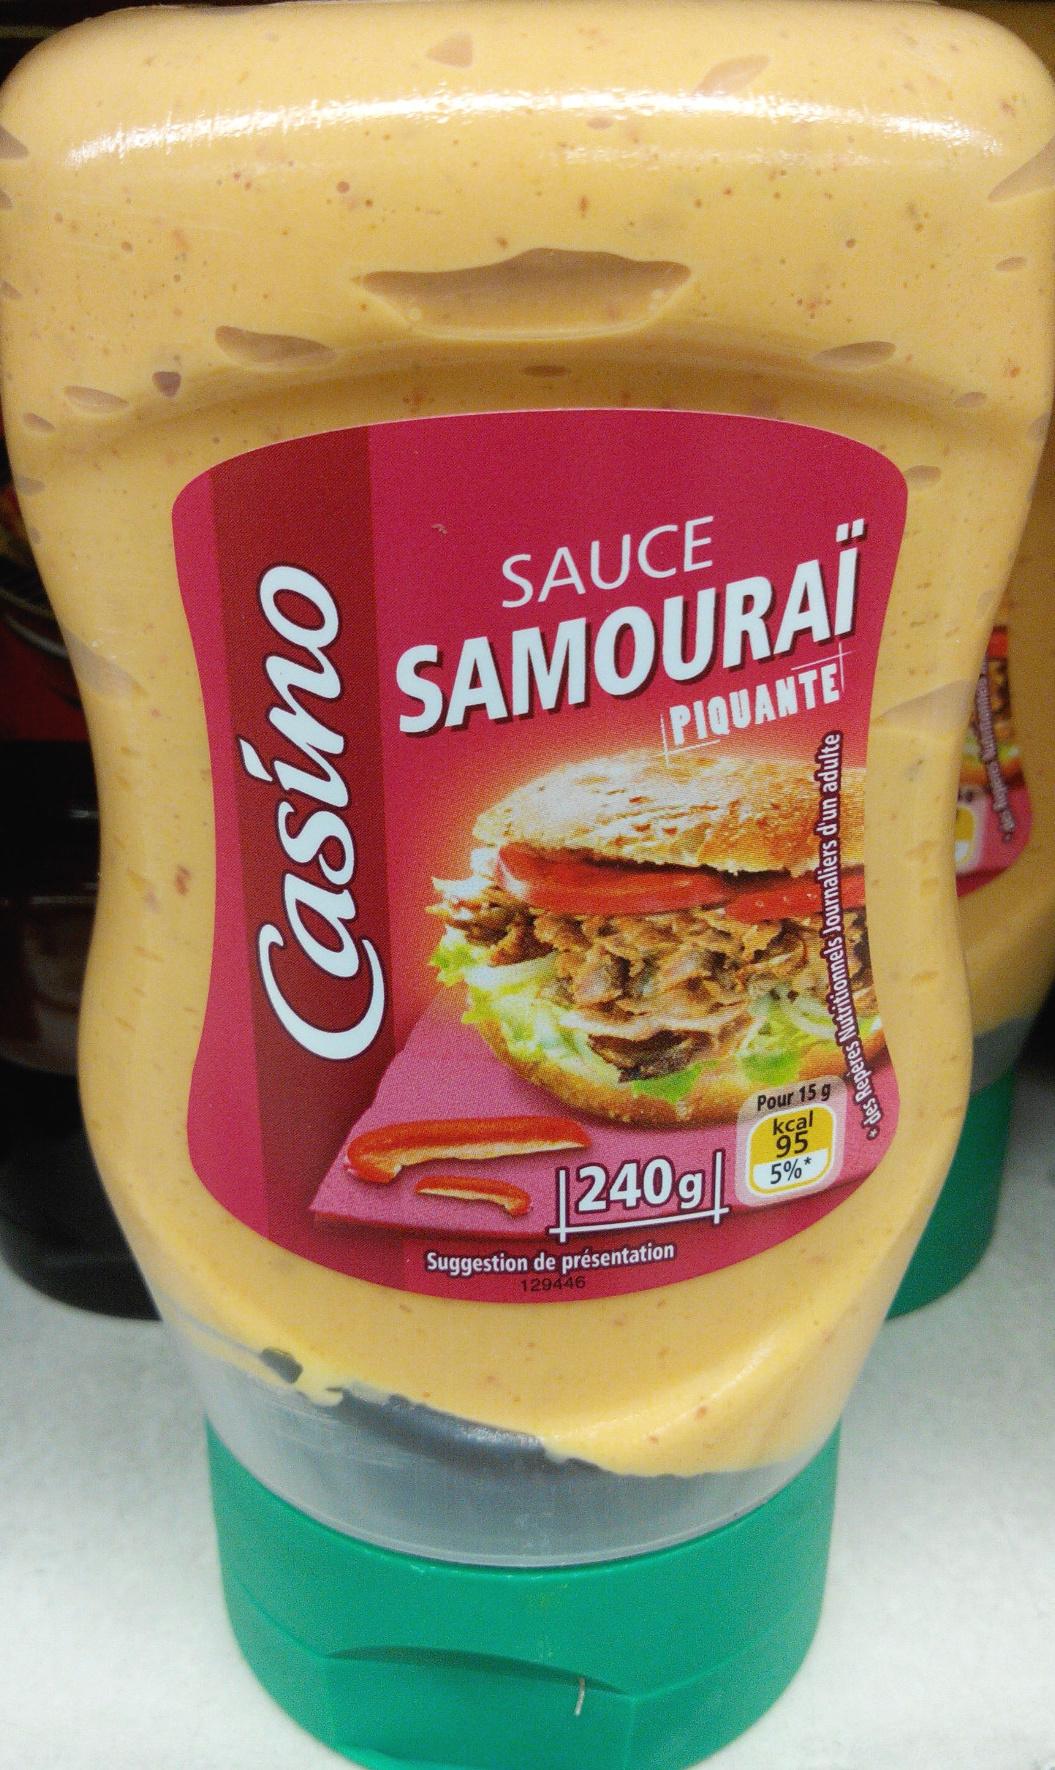 Sauce samouraï piquante - Produit